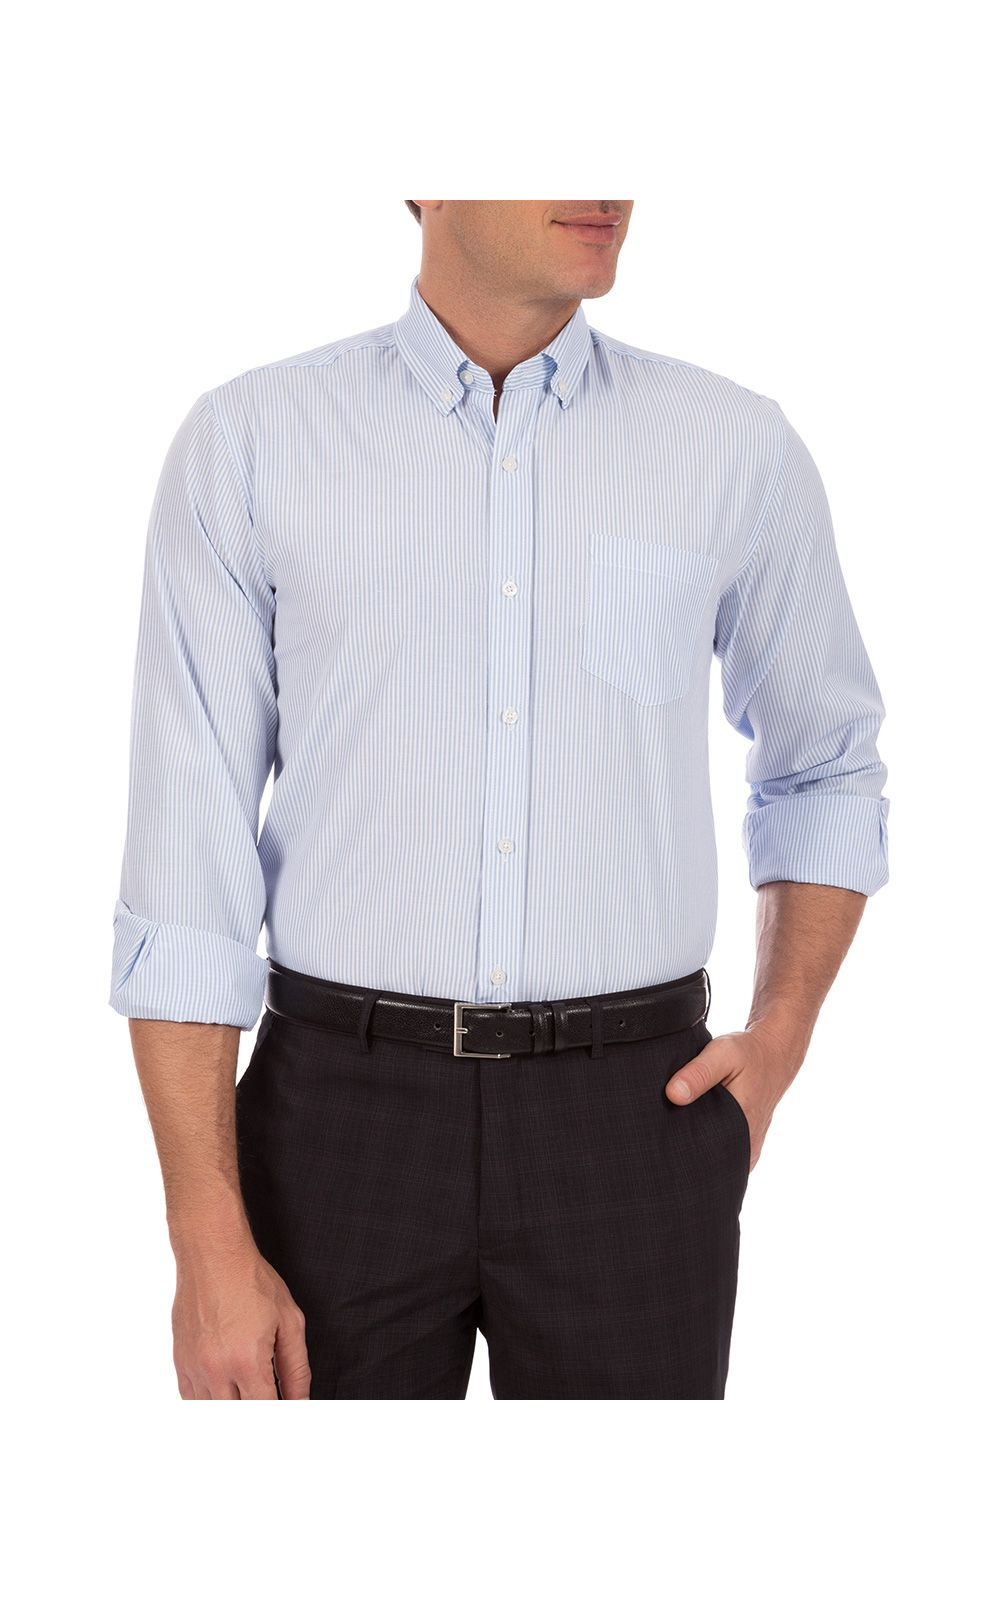 Foto 1 - Camisa Social Masculina Azul Listrada